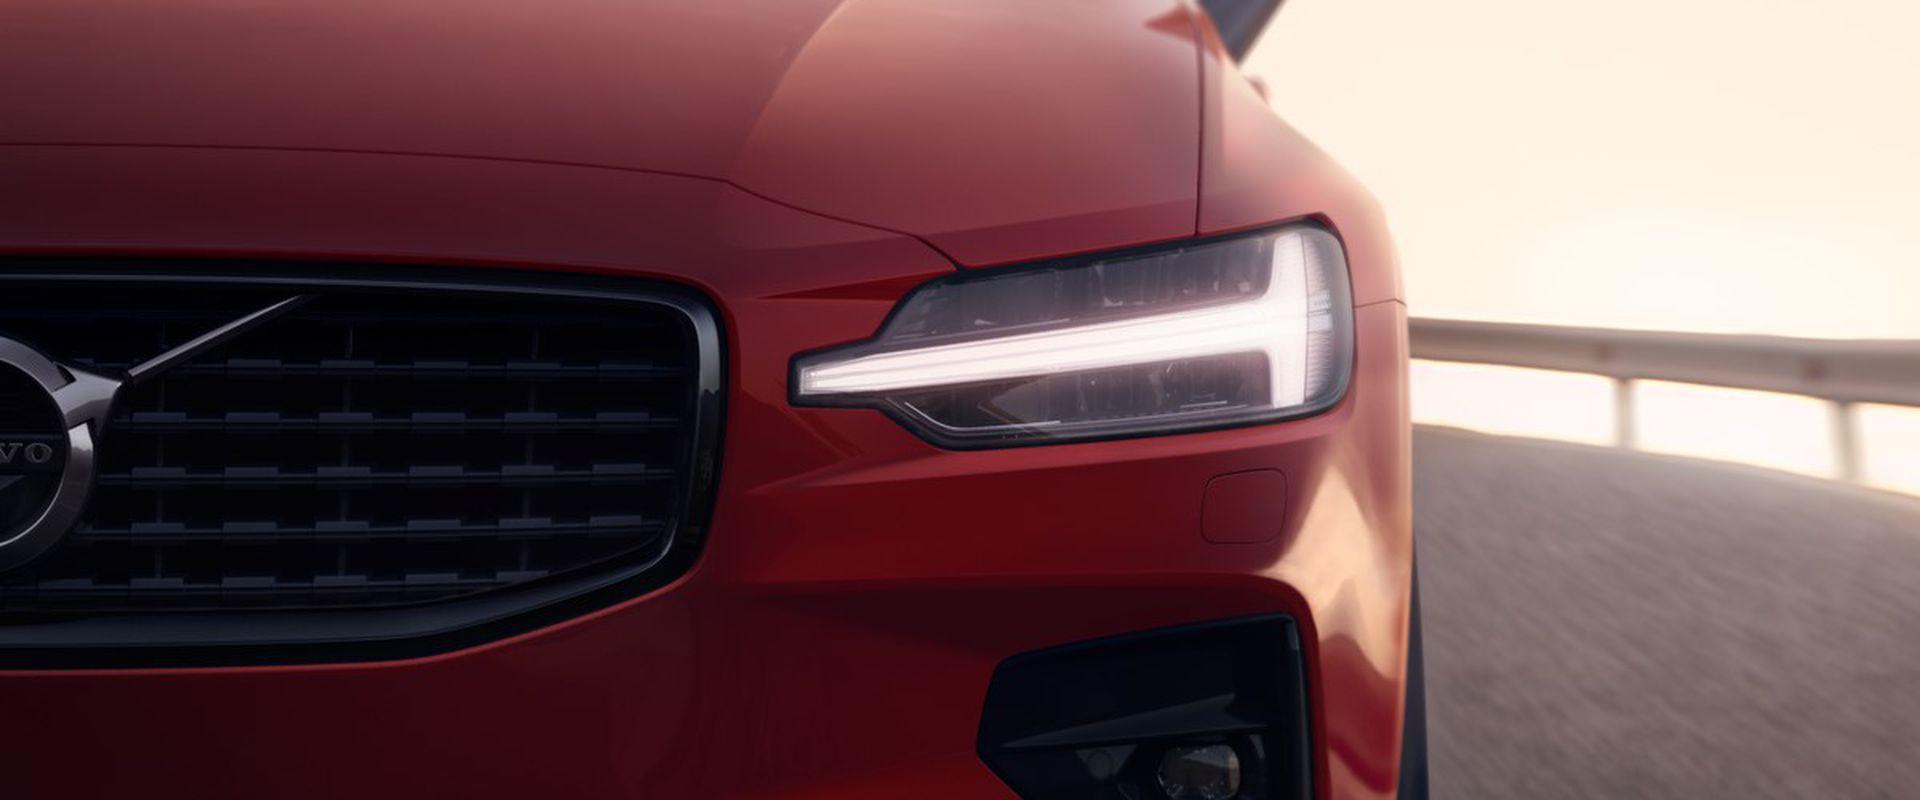 Volvo modellek 5 év garanciával